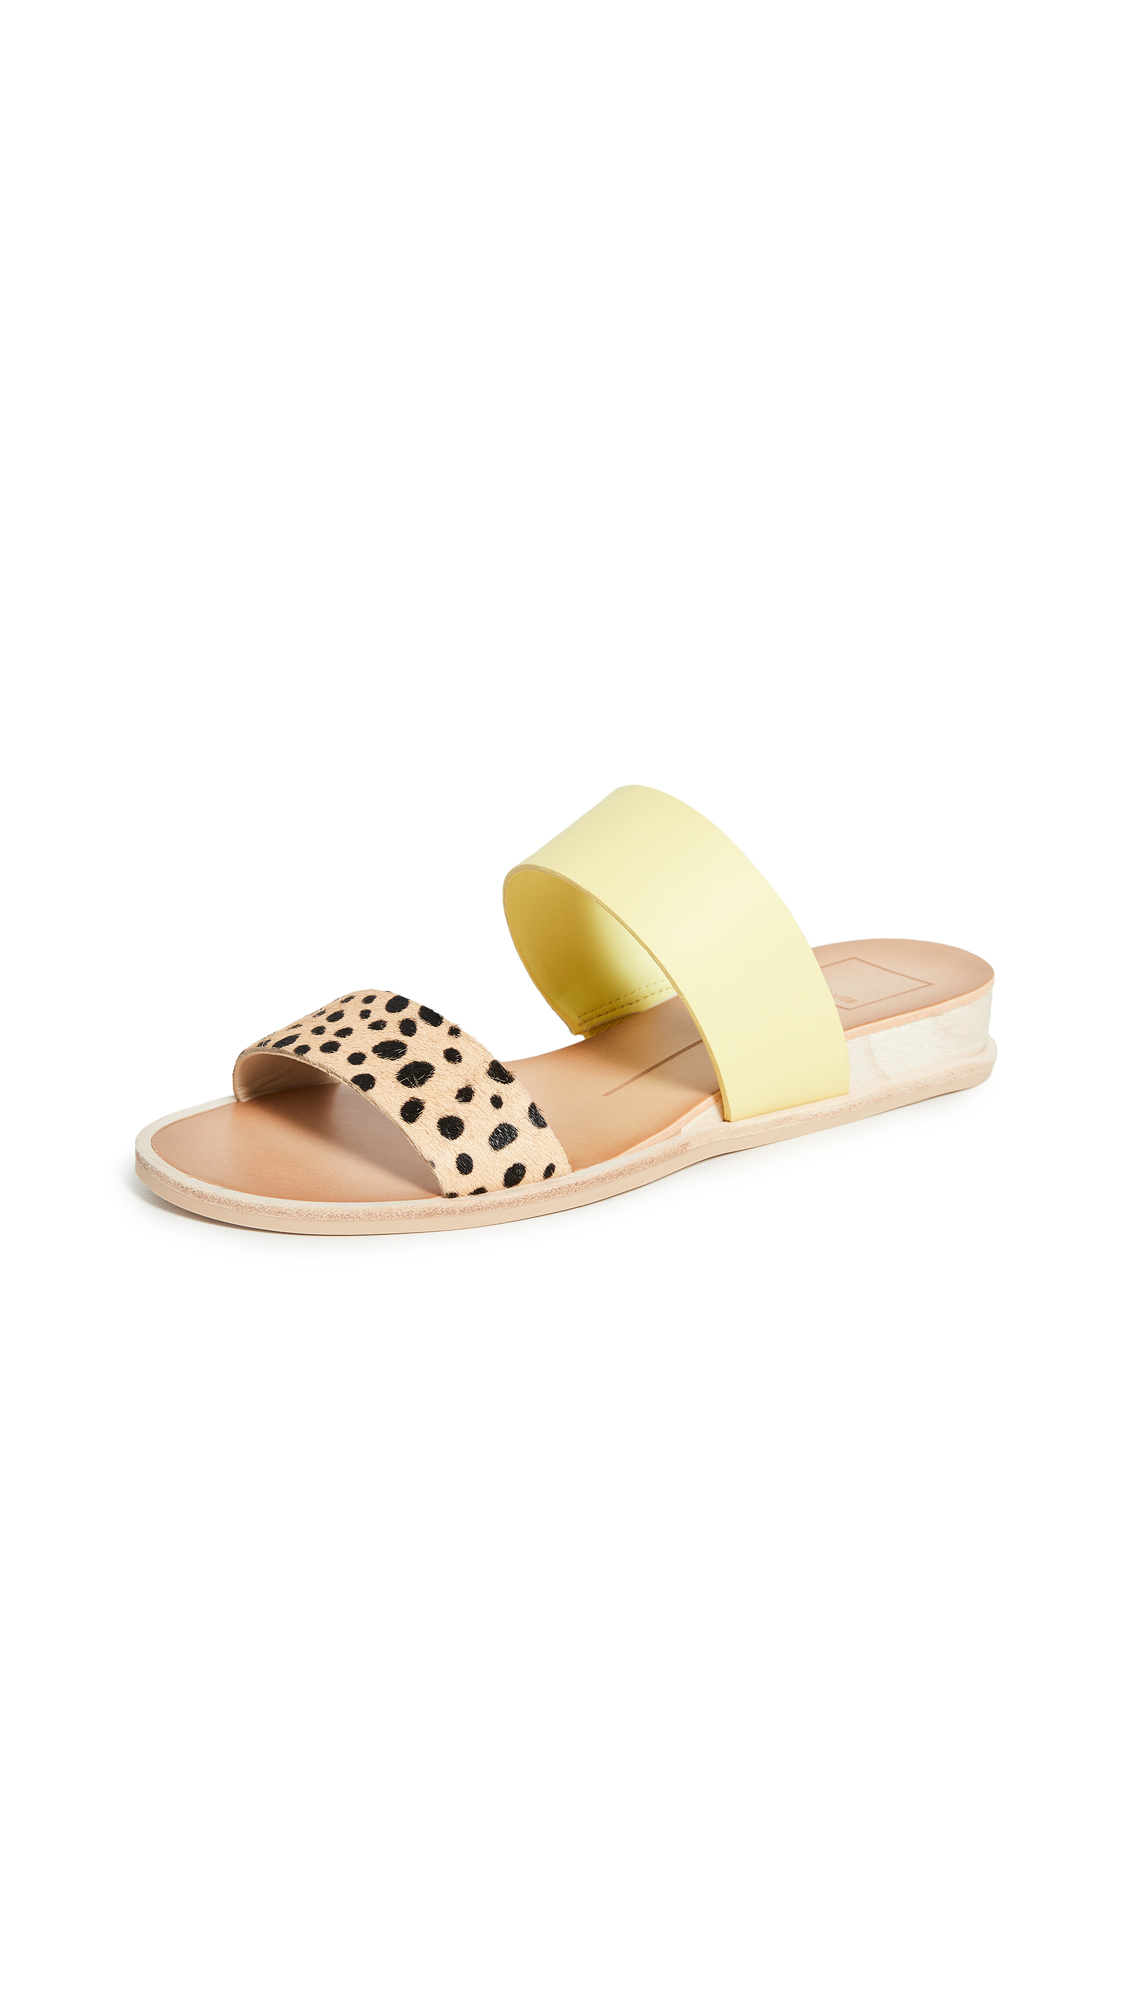 Buy Dolce Vita Payce Slide Sandals online, shop Dolce Vita